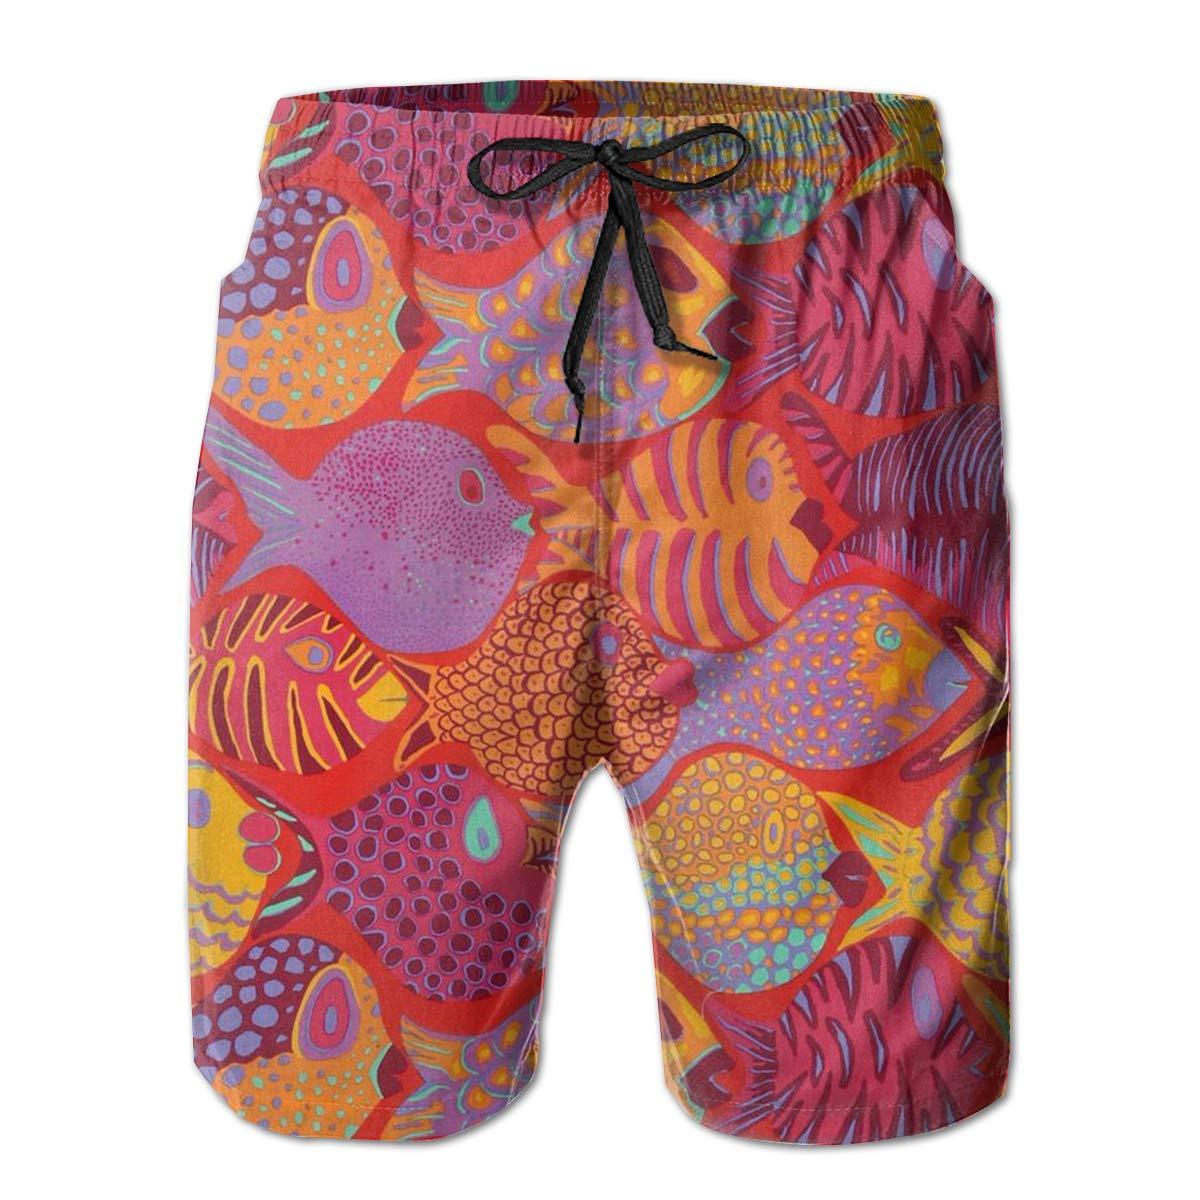 FANTASY SPACE Comfort Men /& Boys Big /&Tall Cargo Short Board Shorts for Beach Outdoor Workout